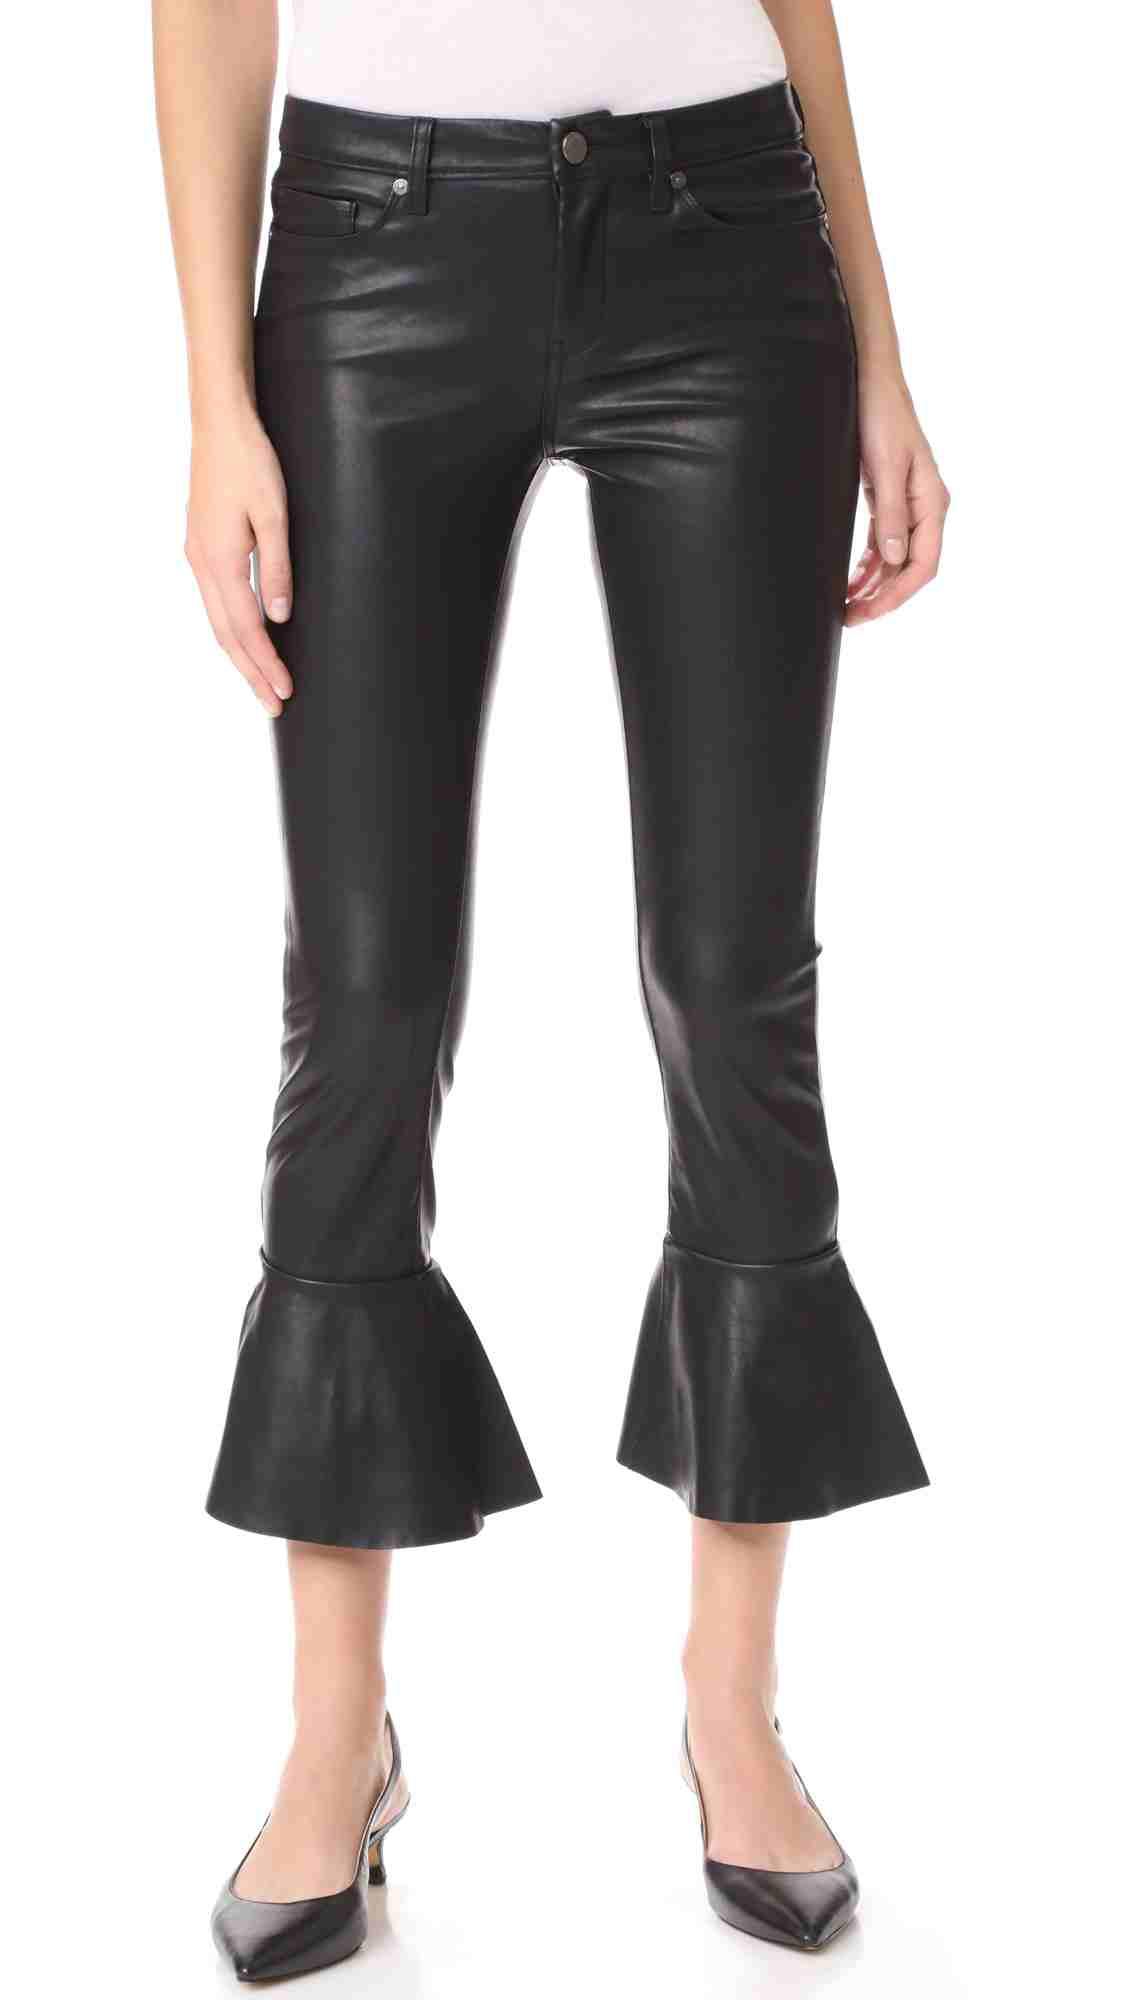 Black Denim Ruffle Butter Pants | Hermosaz